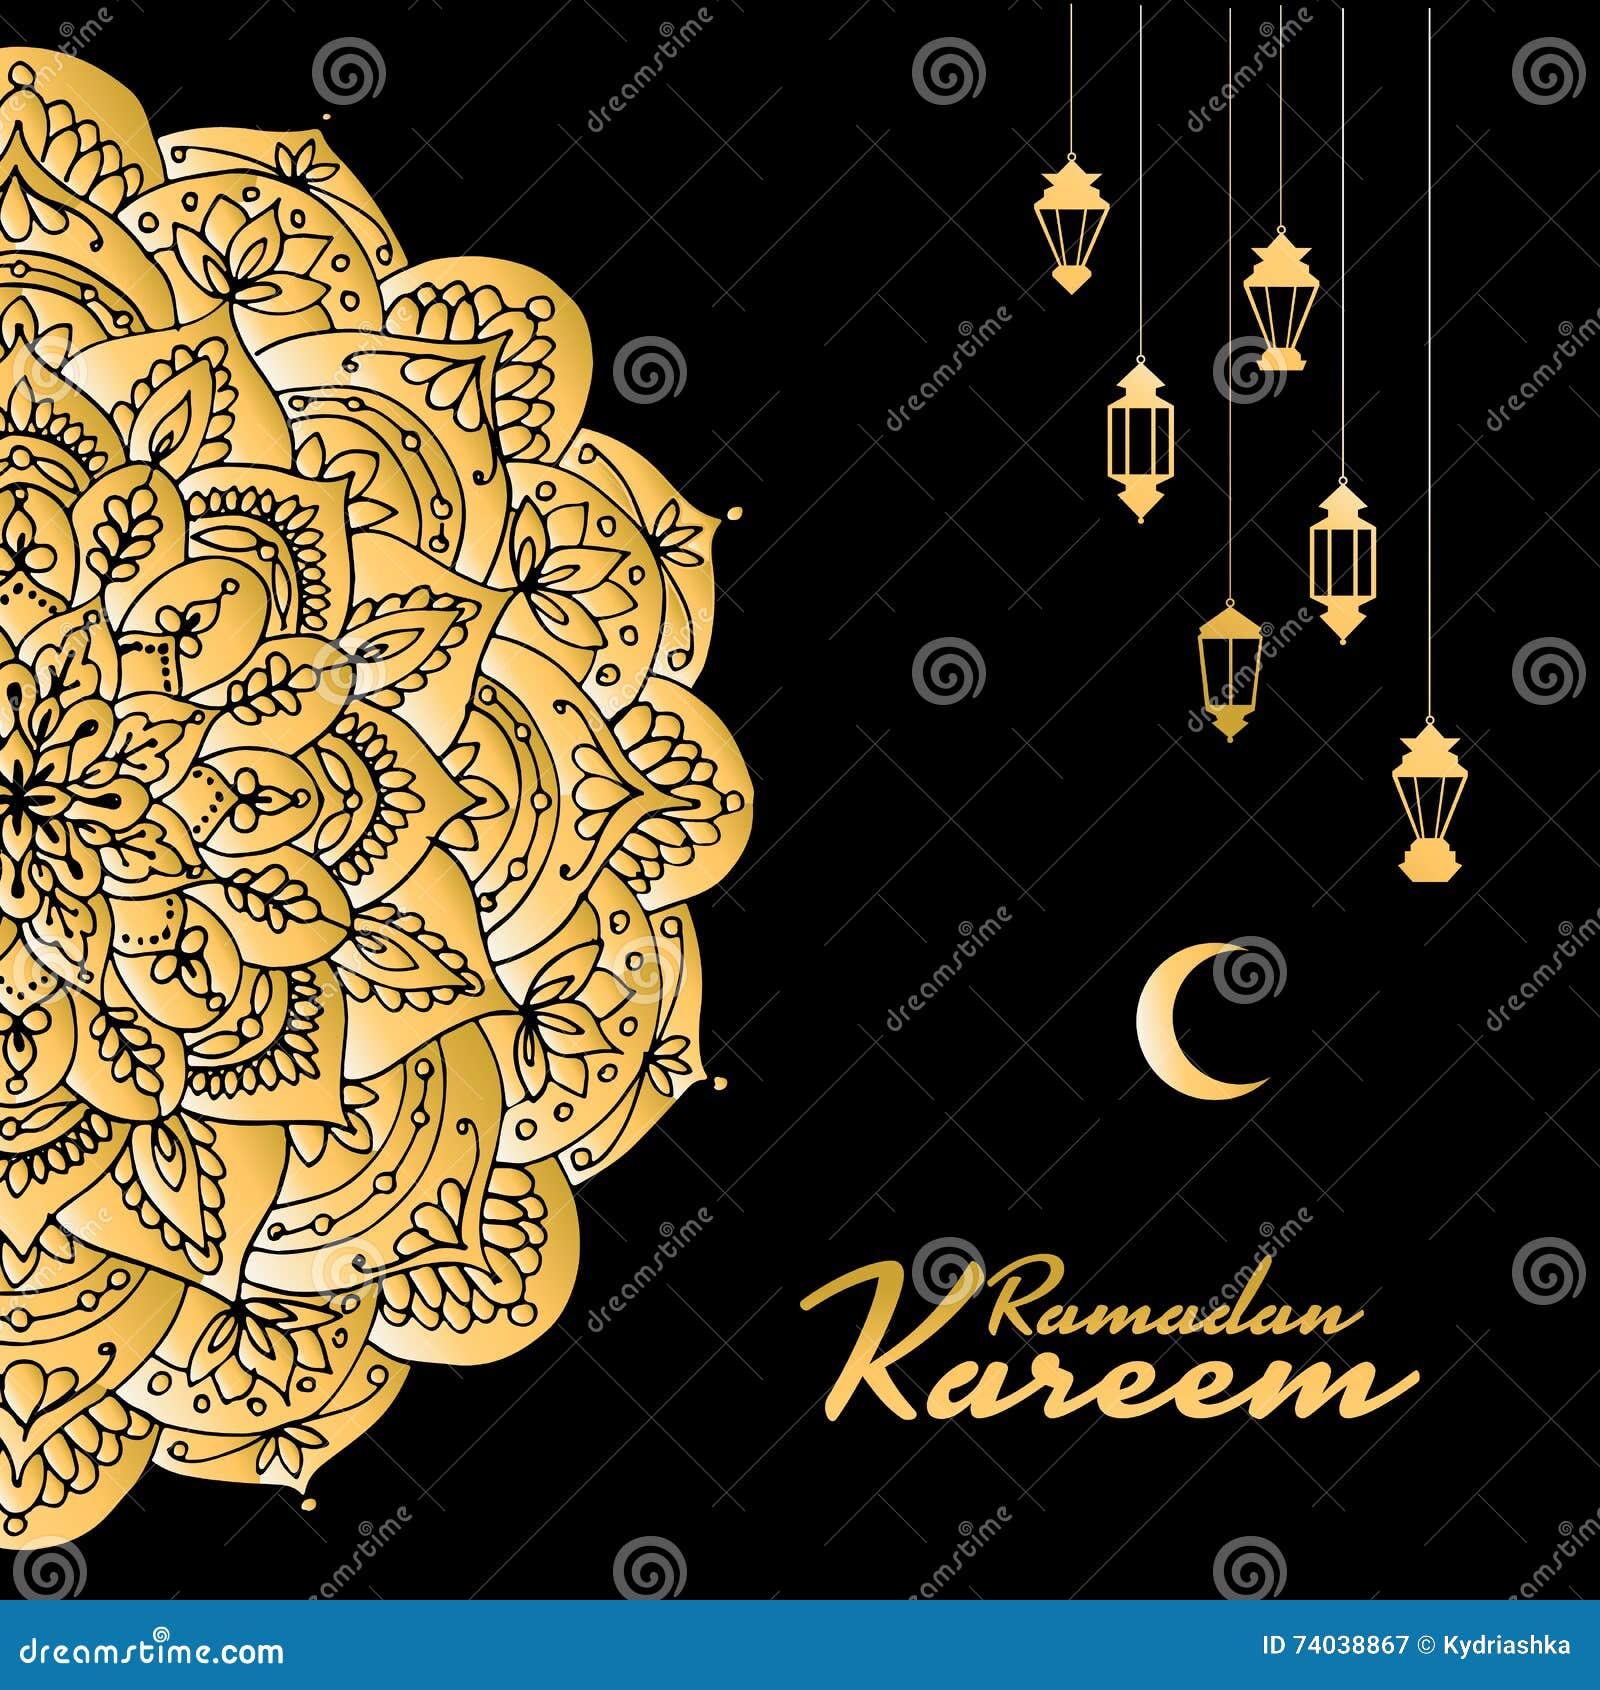 Traditional ramadan kareem month celebration greeting card design download traditional ramadan kareem month celebration greeting card design stock vector illustration of illustration m4hsunfo